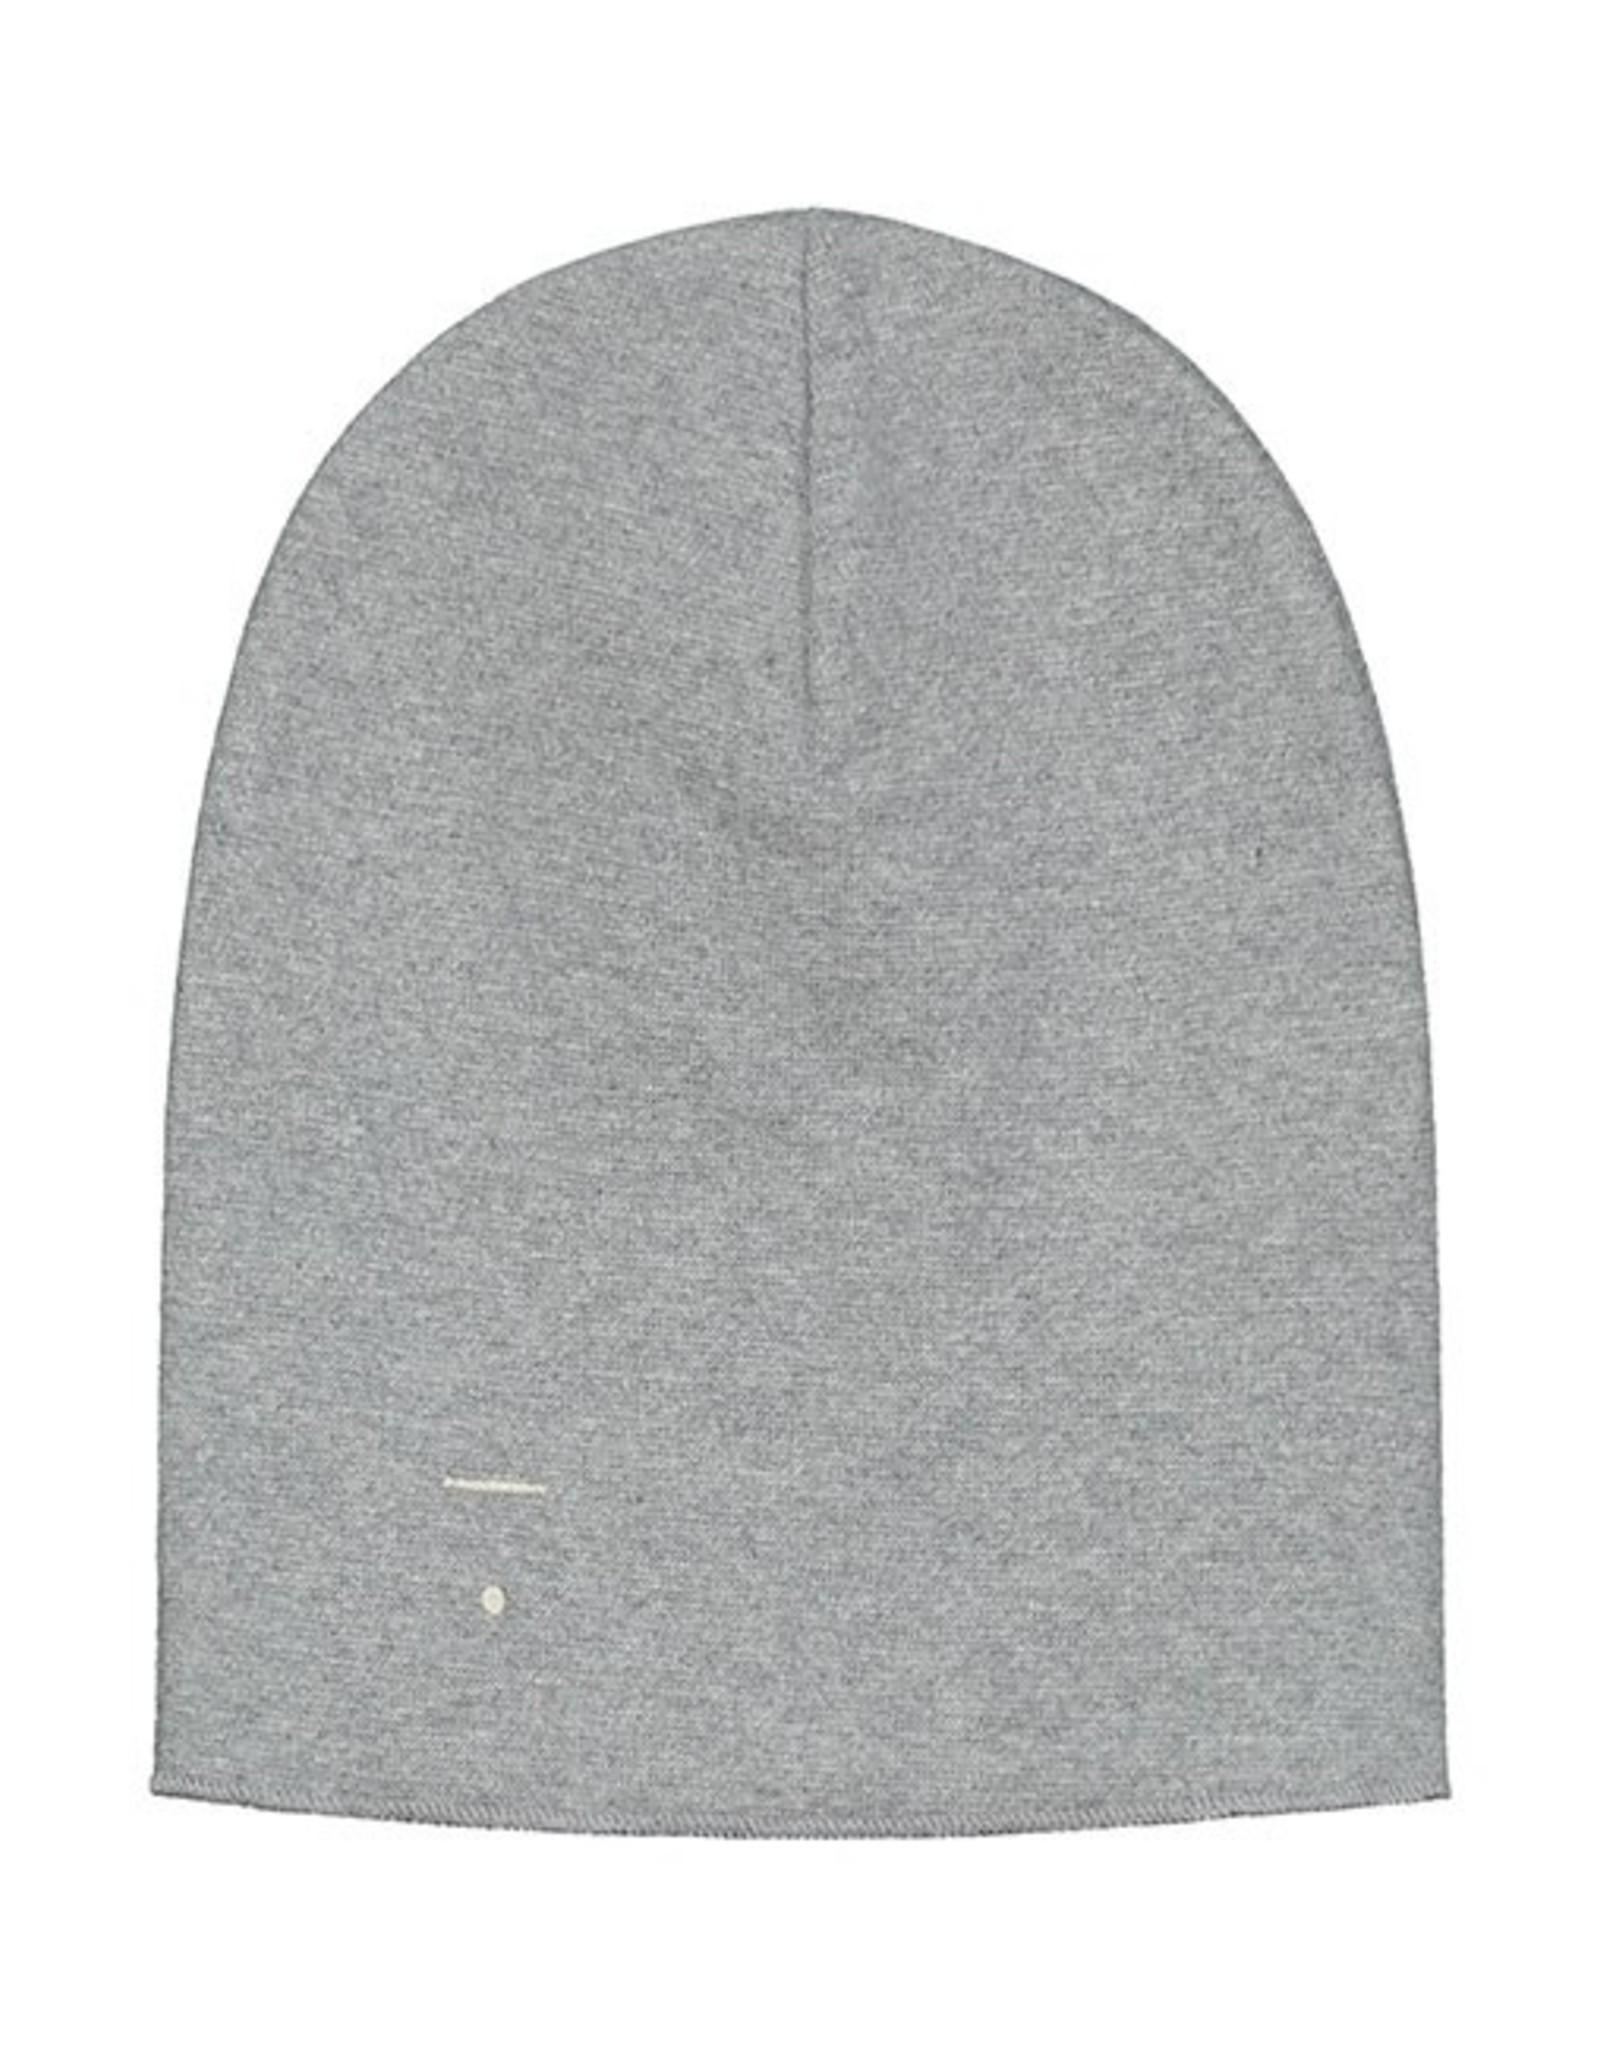 Gray Label Beanie